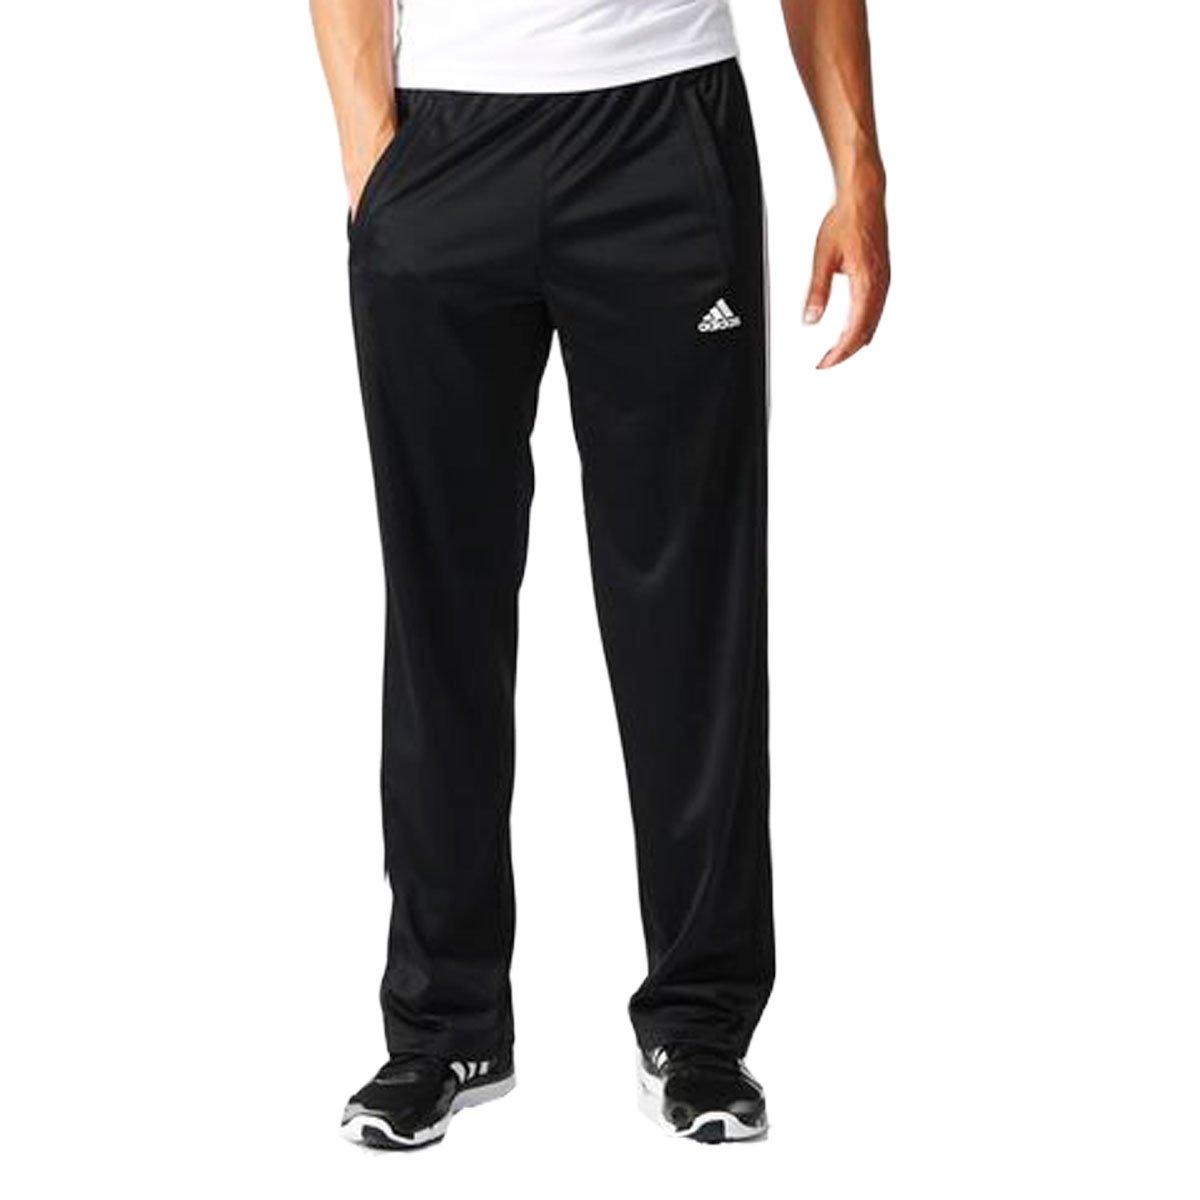 ... Bizz Store - Calça Masculina Adidas Knit 3s Essentials S88117  8023341cbe6ef6  Bizz Store - Chuteira Para Futsal Nike Beco 2 Masculina  646433 ... 124f1b2353e37